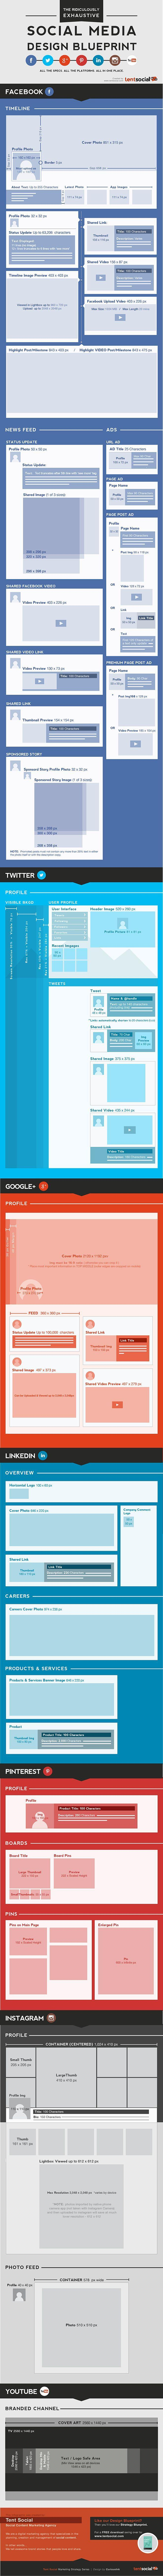 Social Media Design Blueprint Infographic | via #BornToBeSocial - Pinterest Marketing